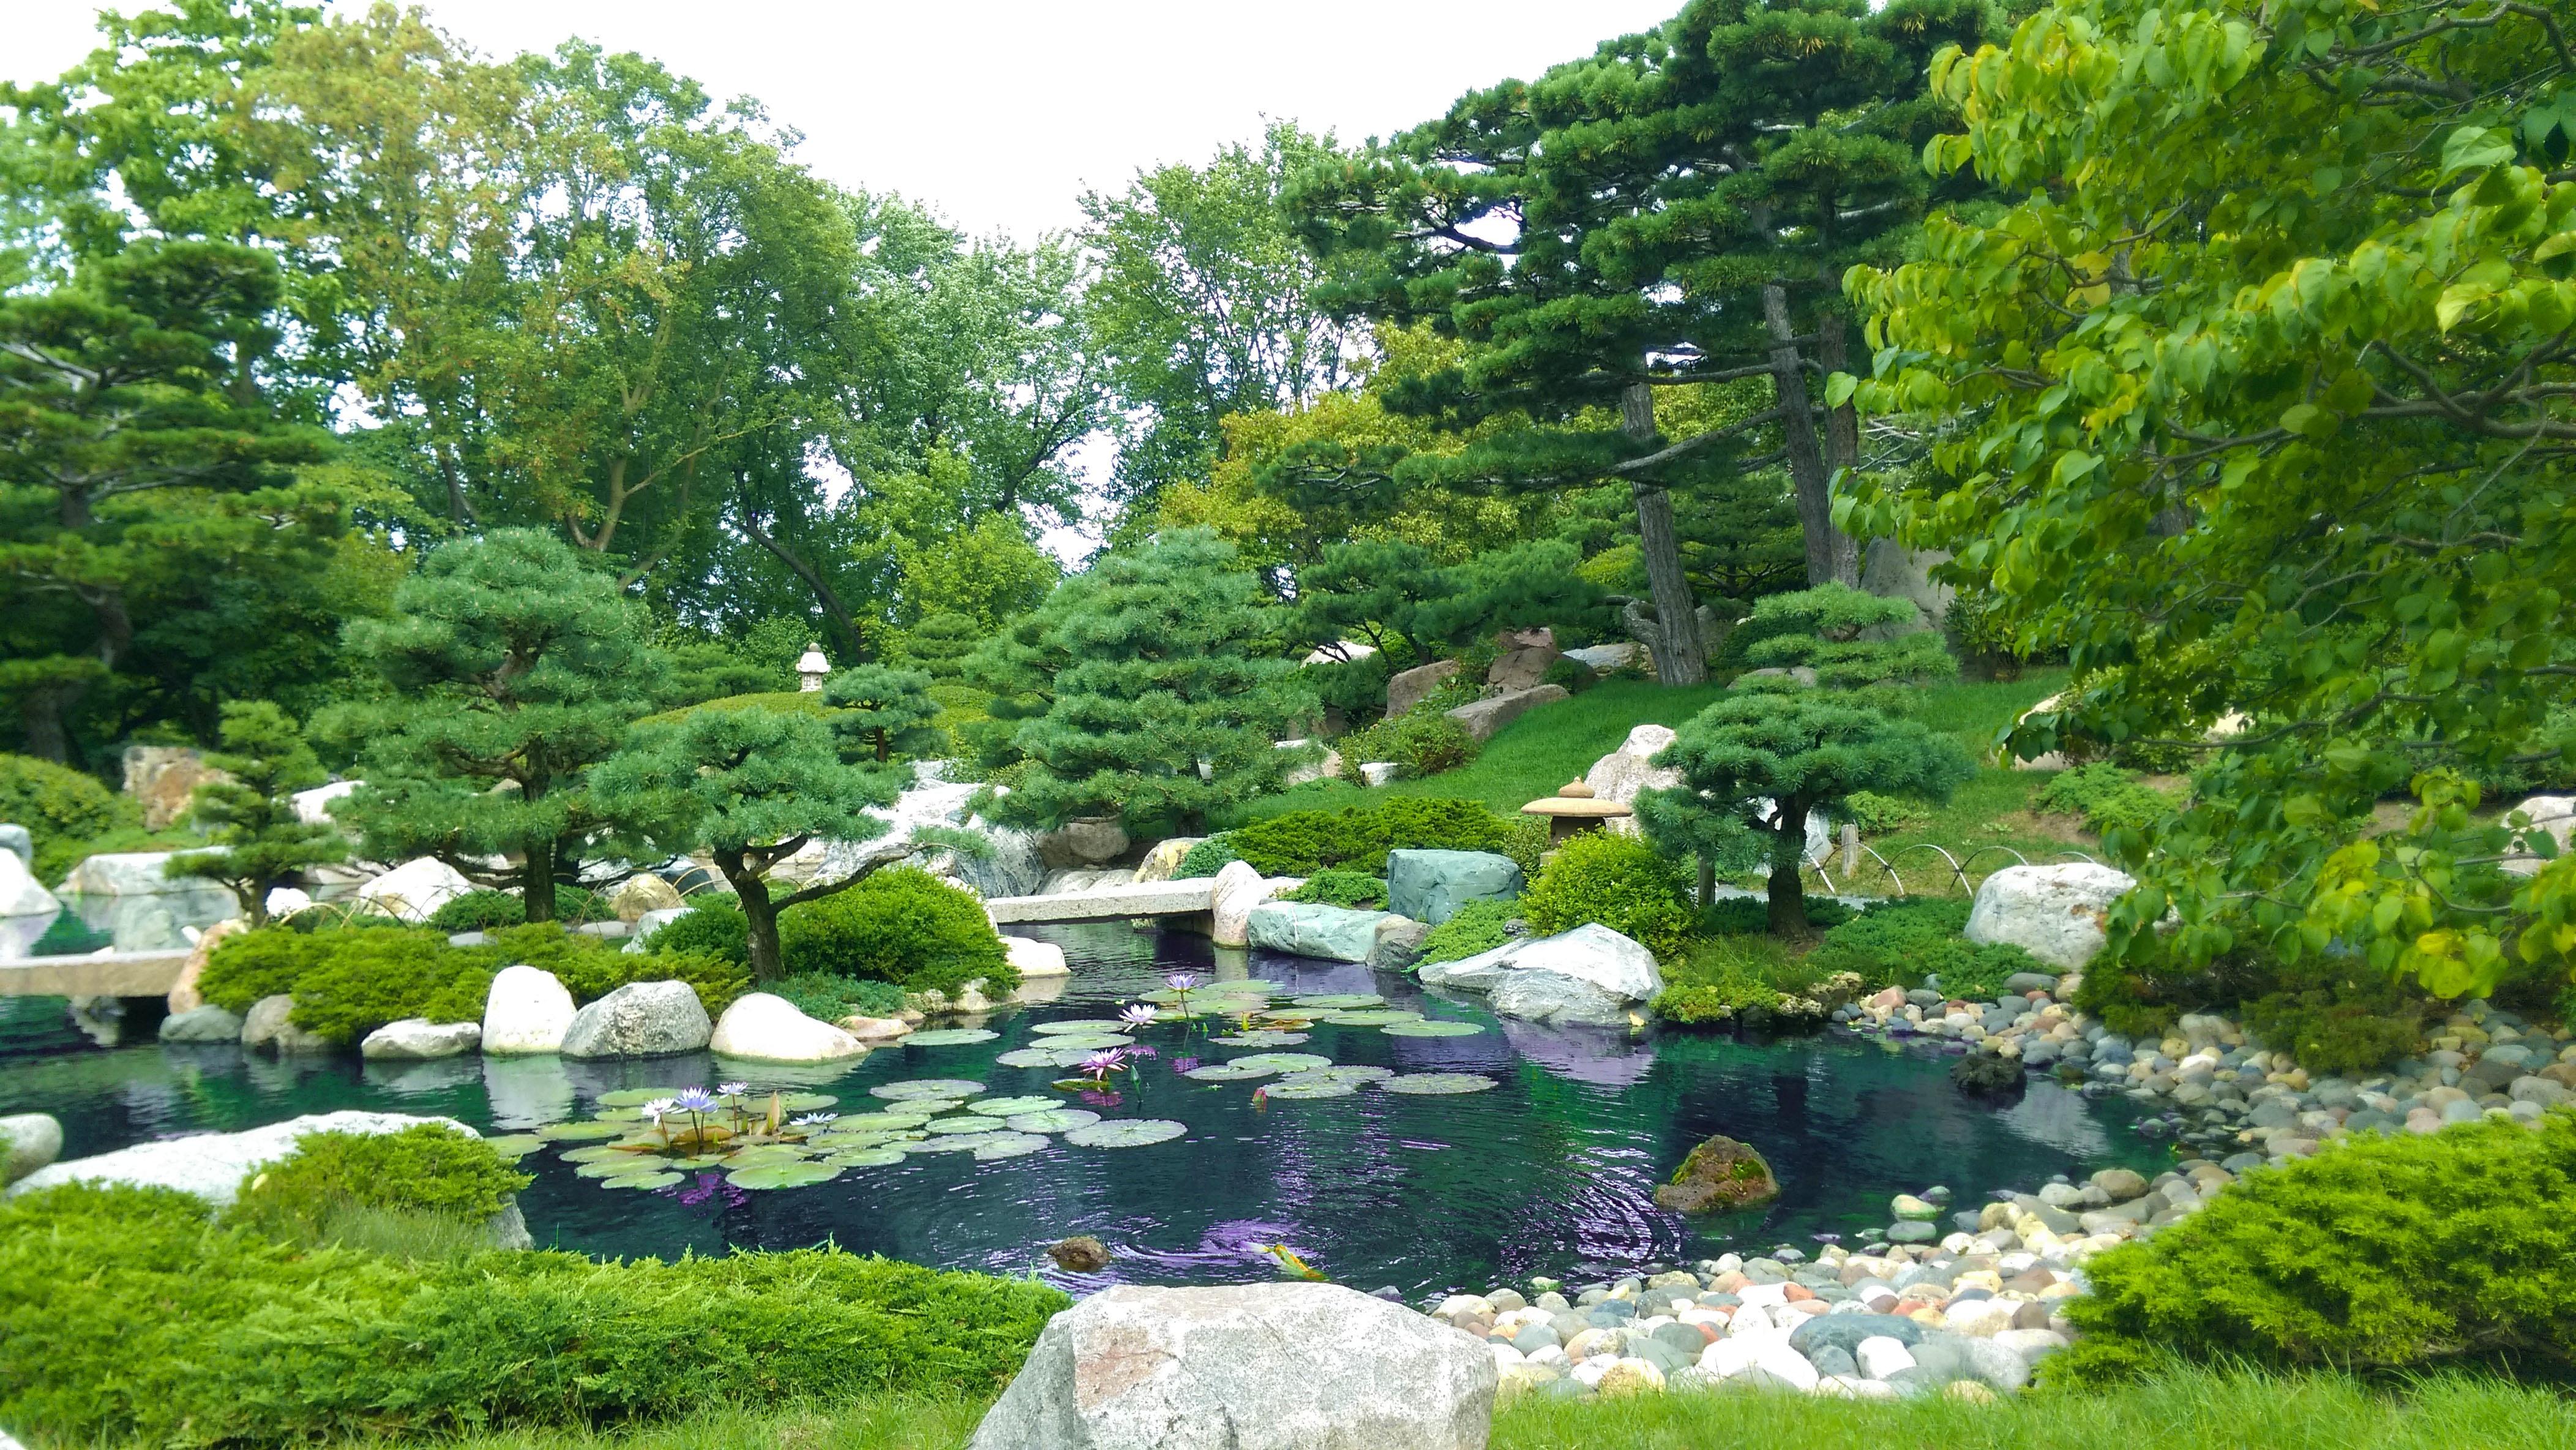 Lawn Flower Pond Backyard Botany Garden Landscaping Botanical Garden Yard  Ecosystem Landscape Architect Garden Designer